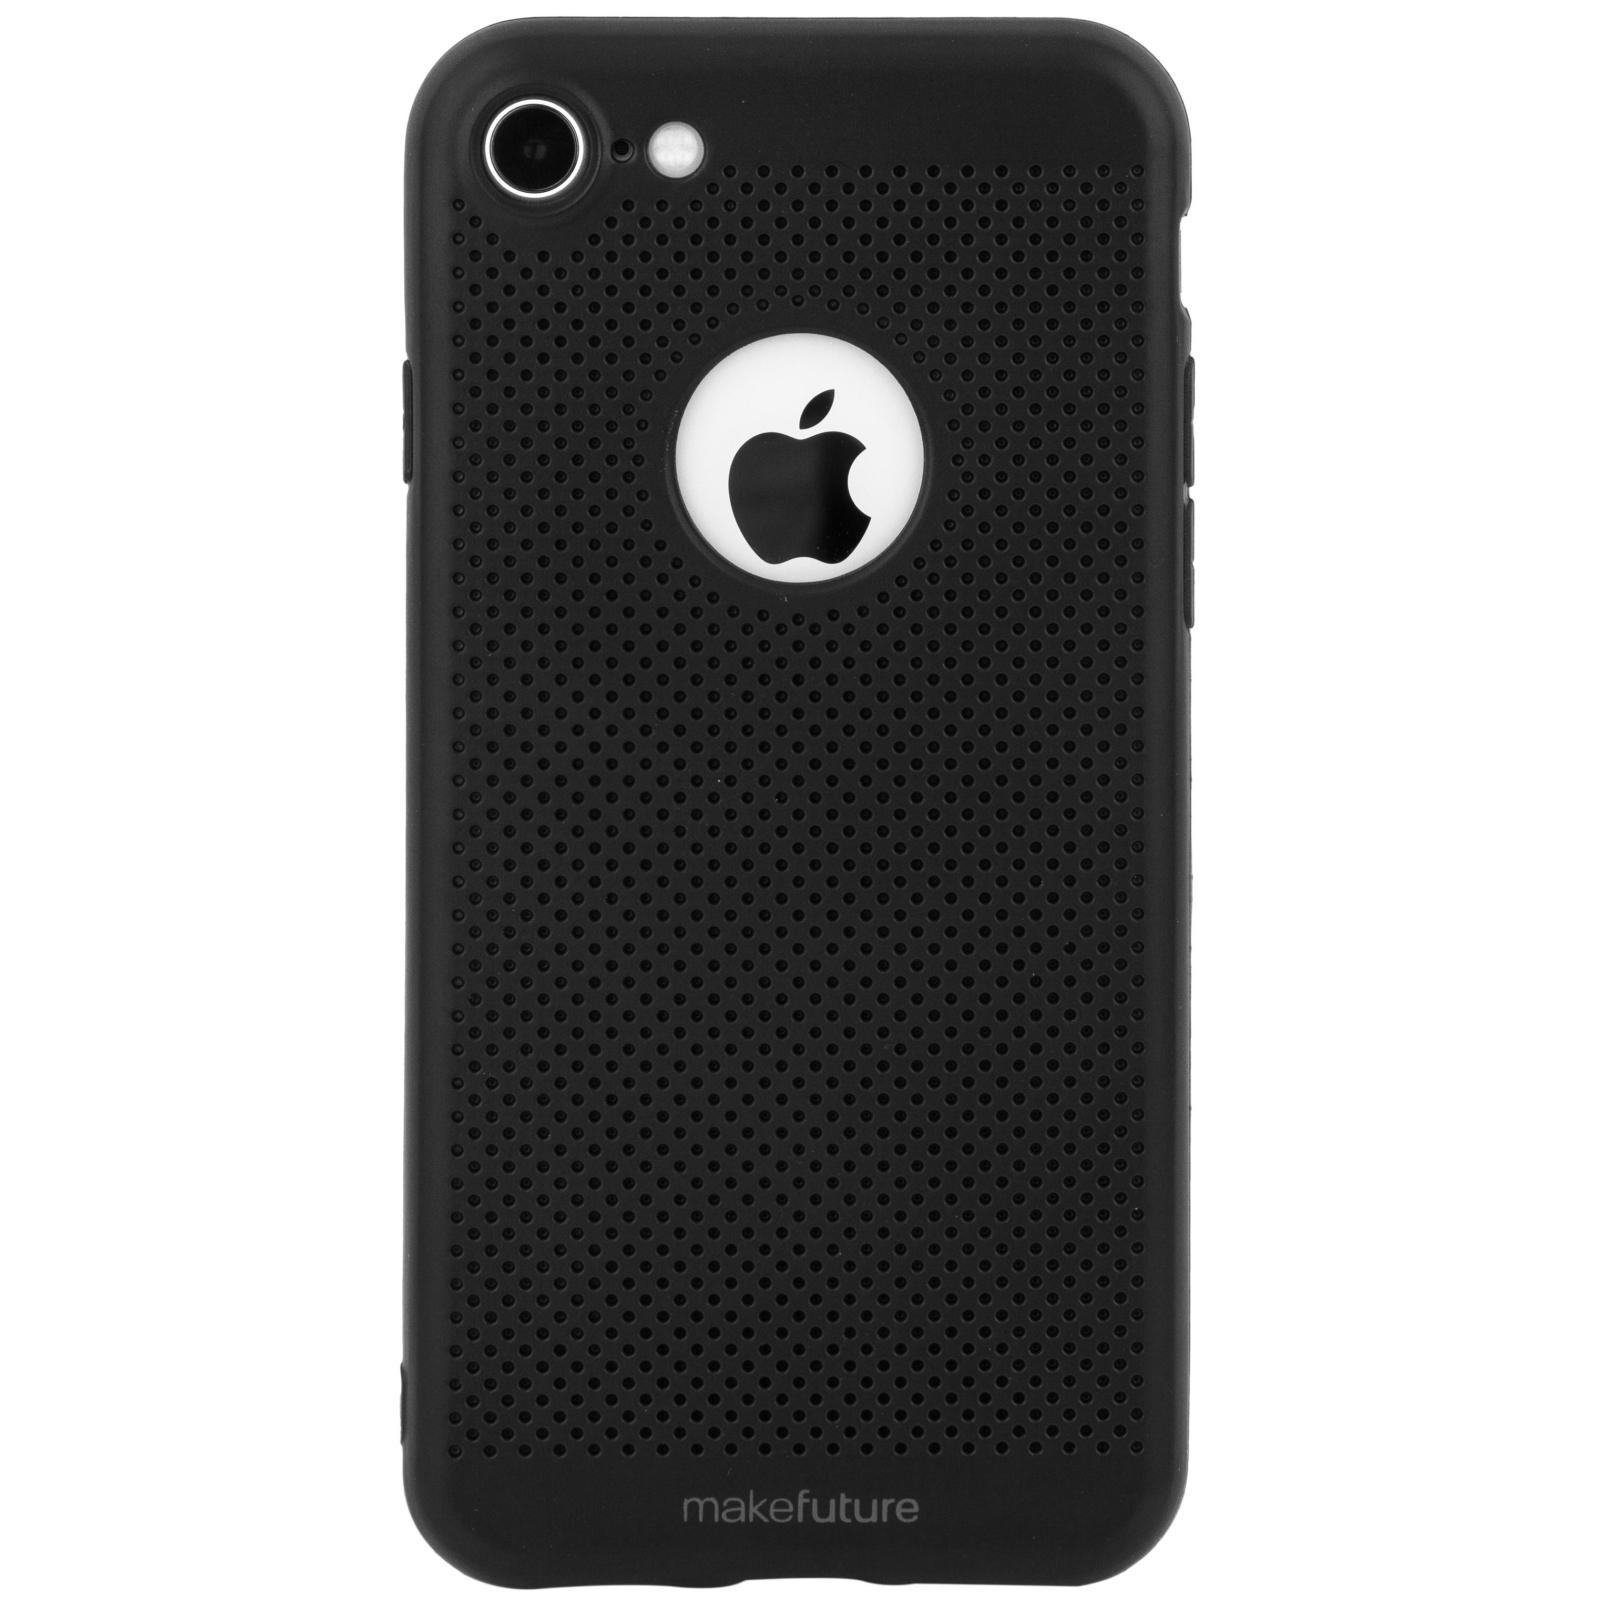 Чехол для моб. телефона MakeFuture Moon Case (TPU) для Apple iPhone 8 Black (MCM-AI8BK)